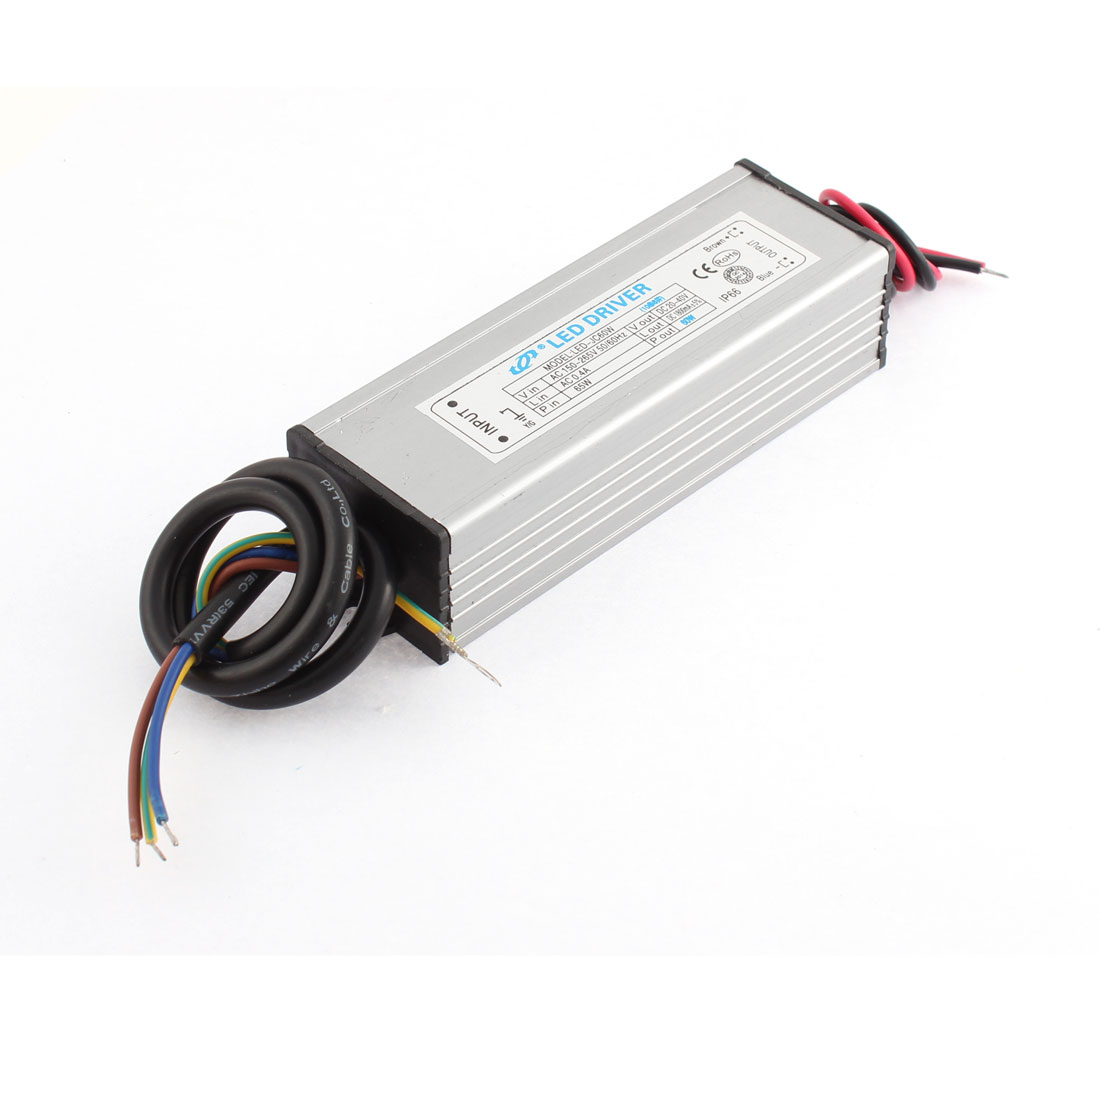 AC 150-265V 0.4A to DC 20-40V 1800mA 60W 10 Parallel 6 Series LED Lightstrip Light Strip Power Supply Driver